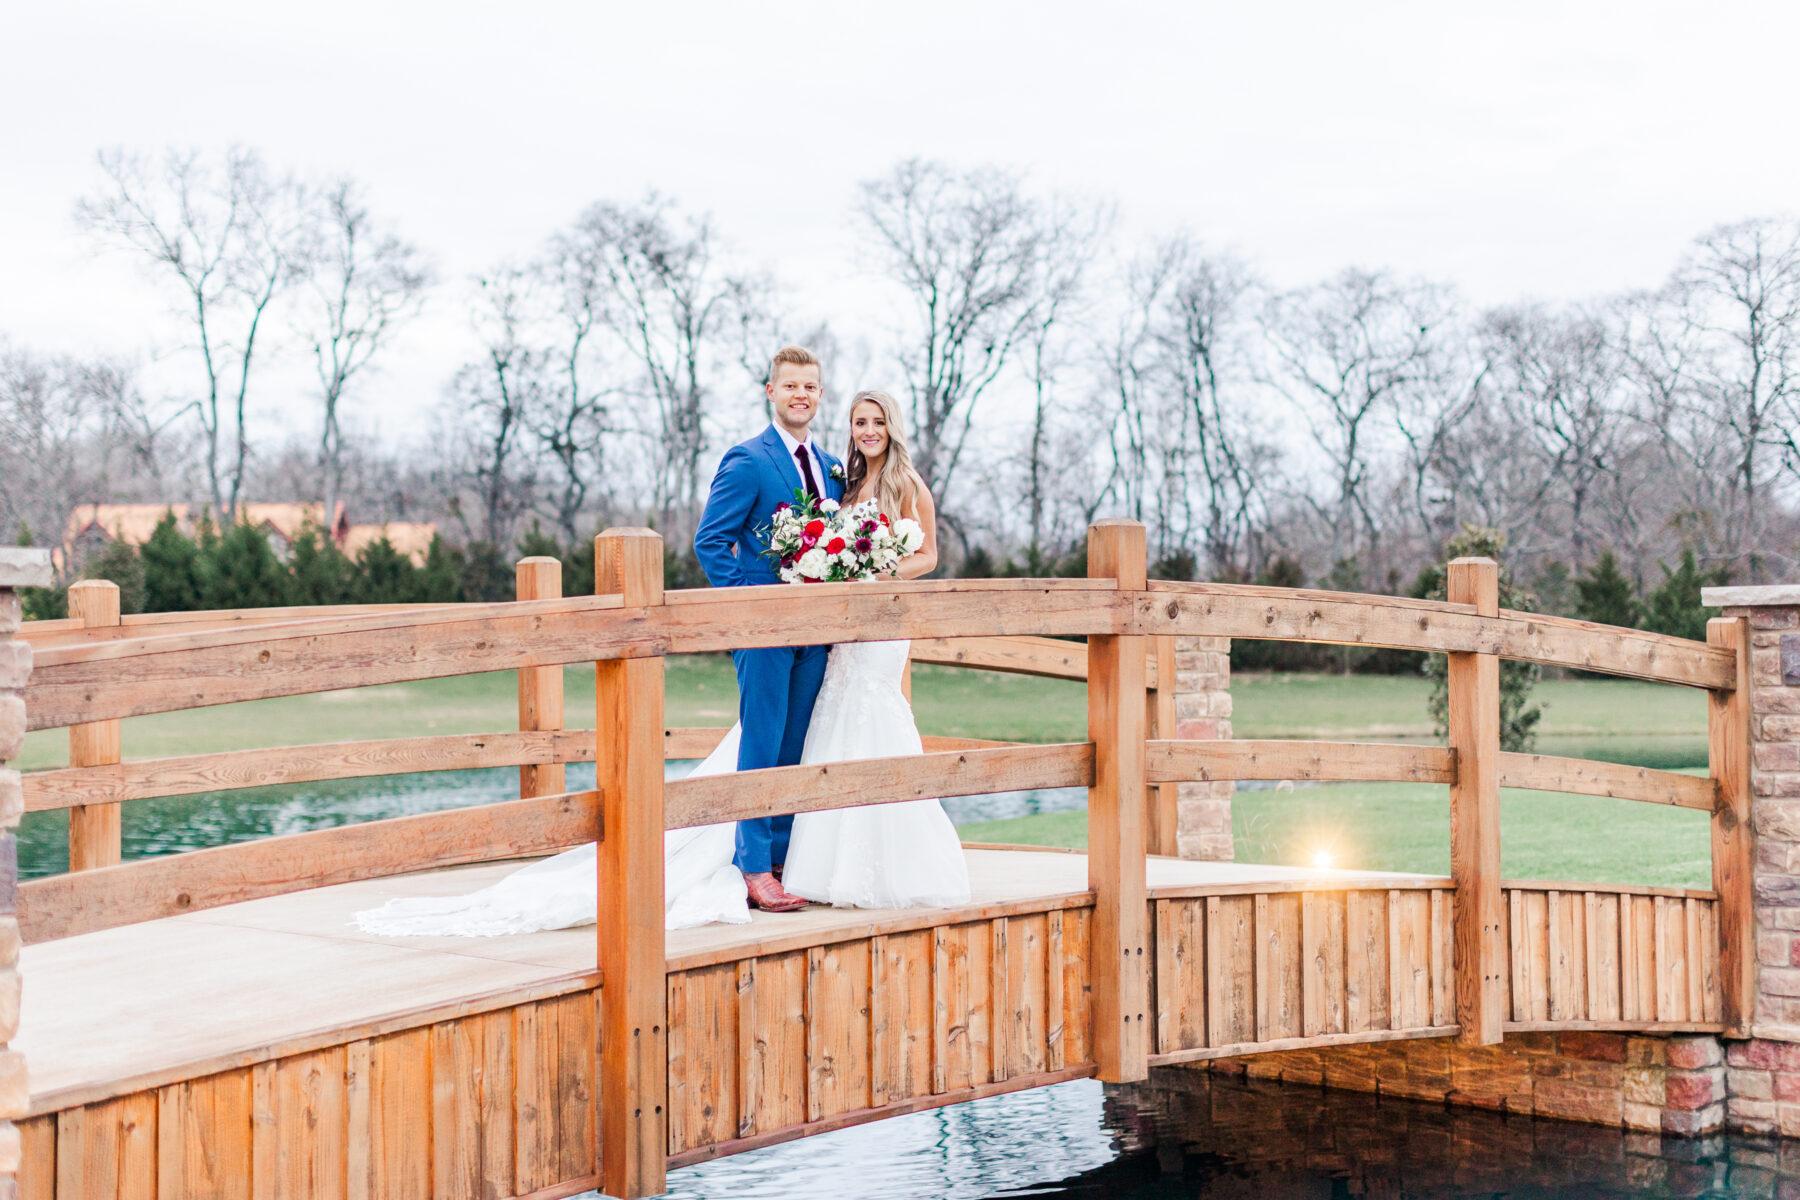 Sycamore Farms Winter Wedding   Nashville Bride Guide